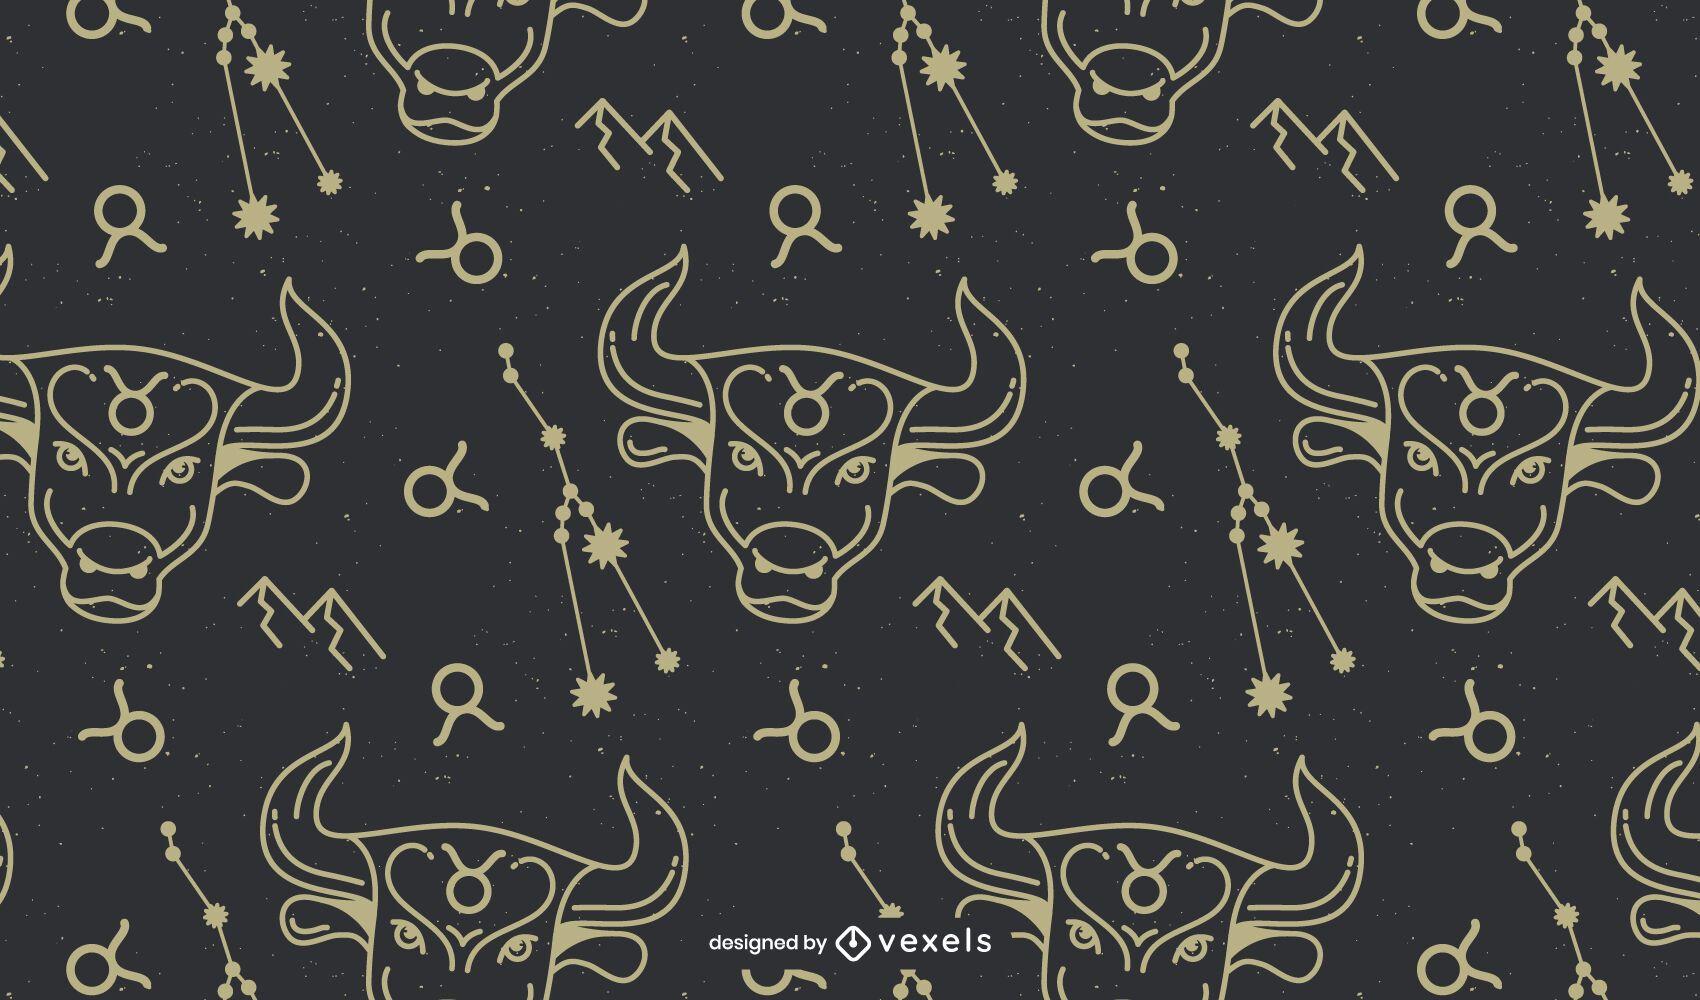 Taurus sign horoscope pattern design